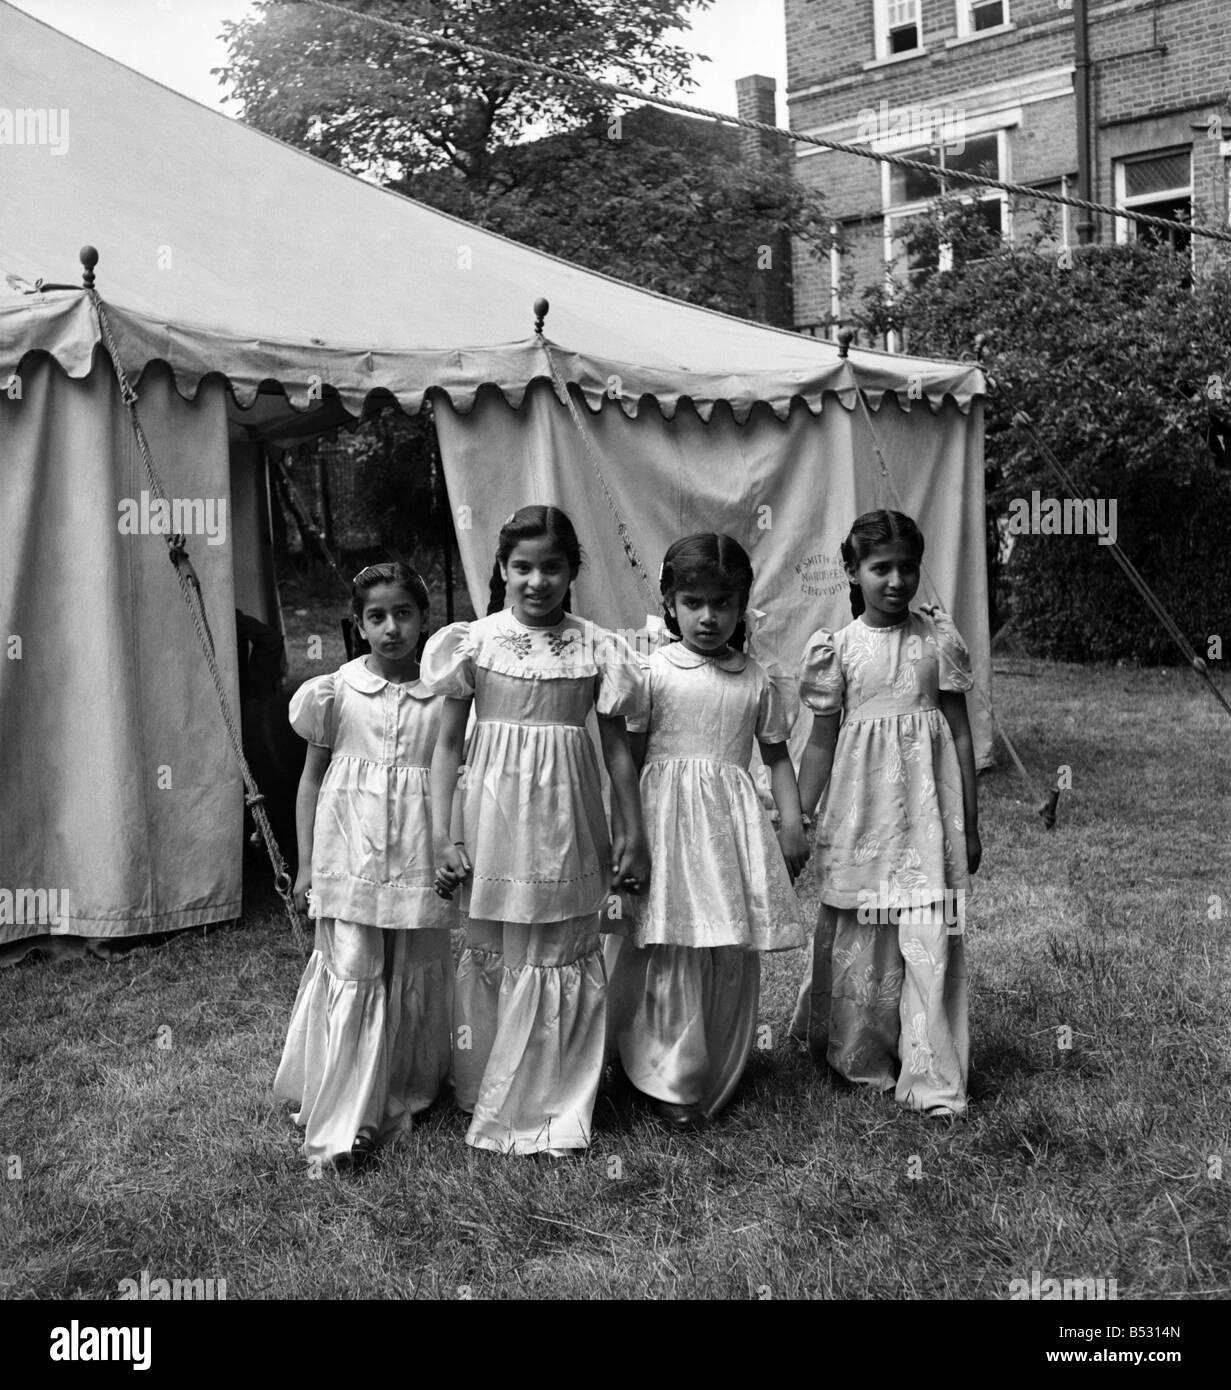 Beautiful Child Eid Al-Fitr Feast - muslim-feast-of-eid-ul-fitr-the-breaking-of-the-fast-celebrated-by-B5314N  You Should Have_706618 .jpg